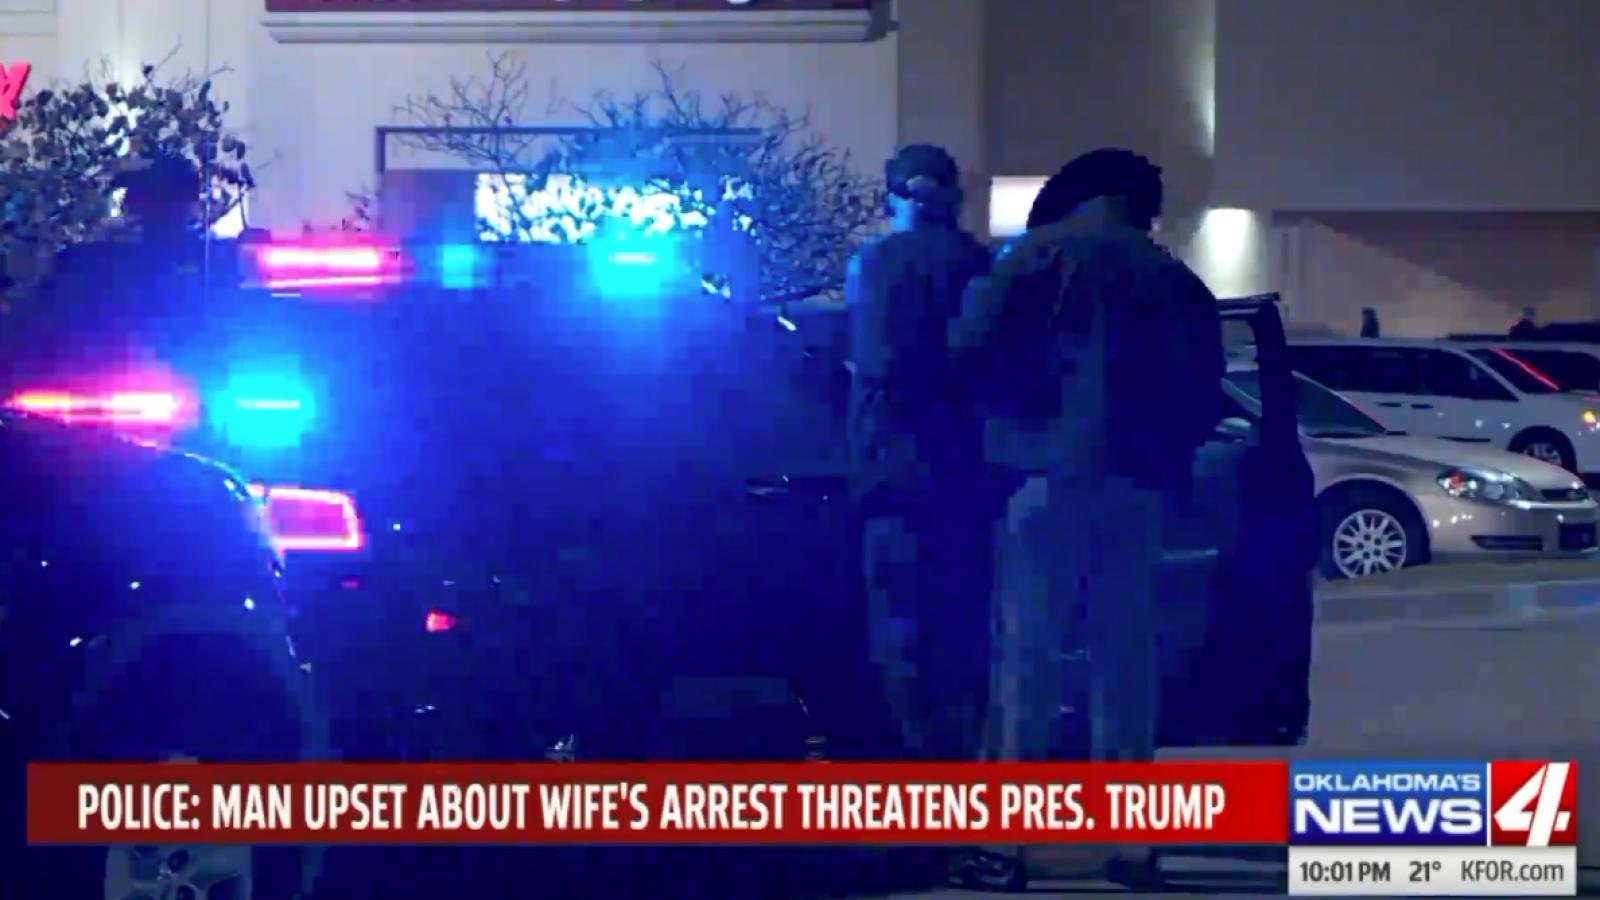 Oklahoma Man Threatens To Kill Trump, 'Every Cop In The